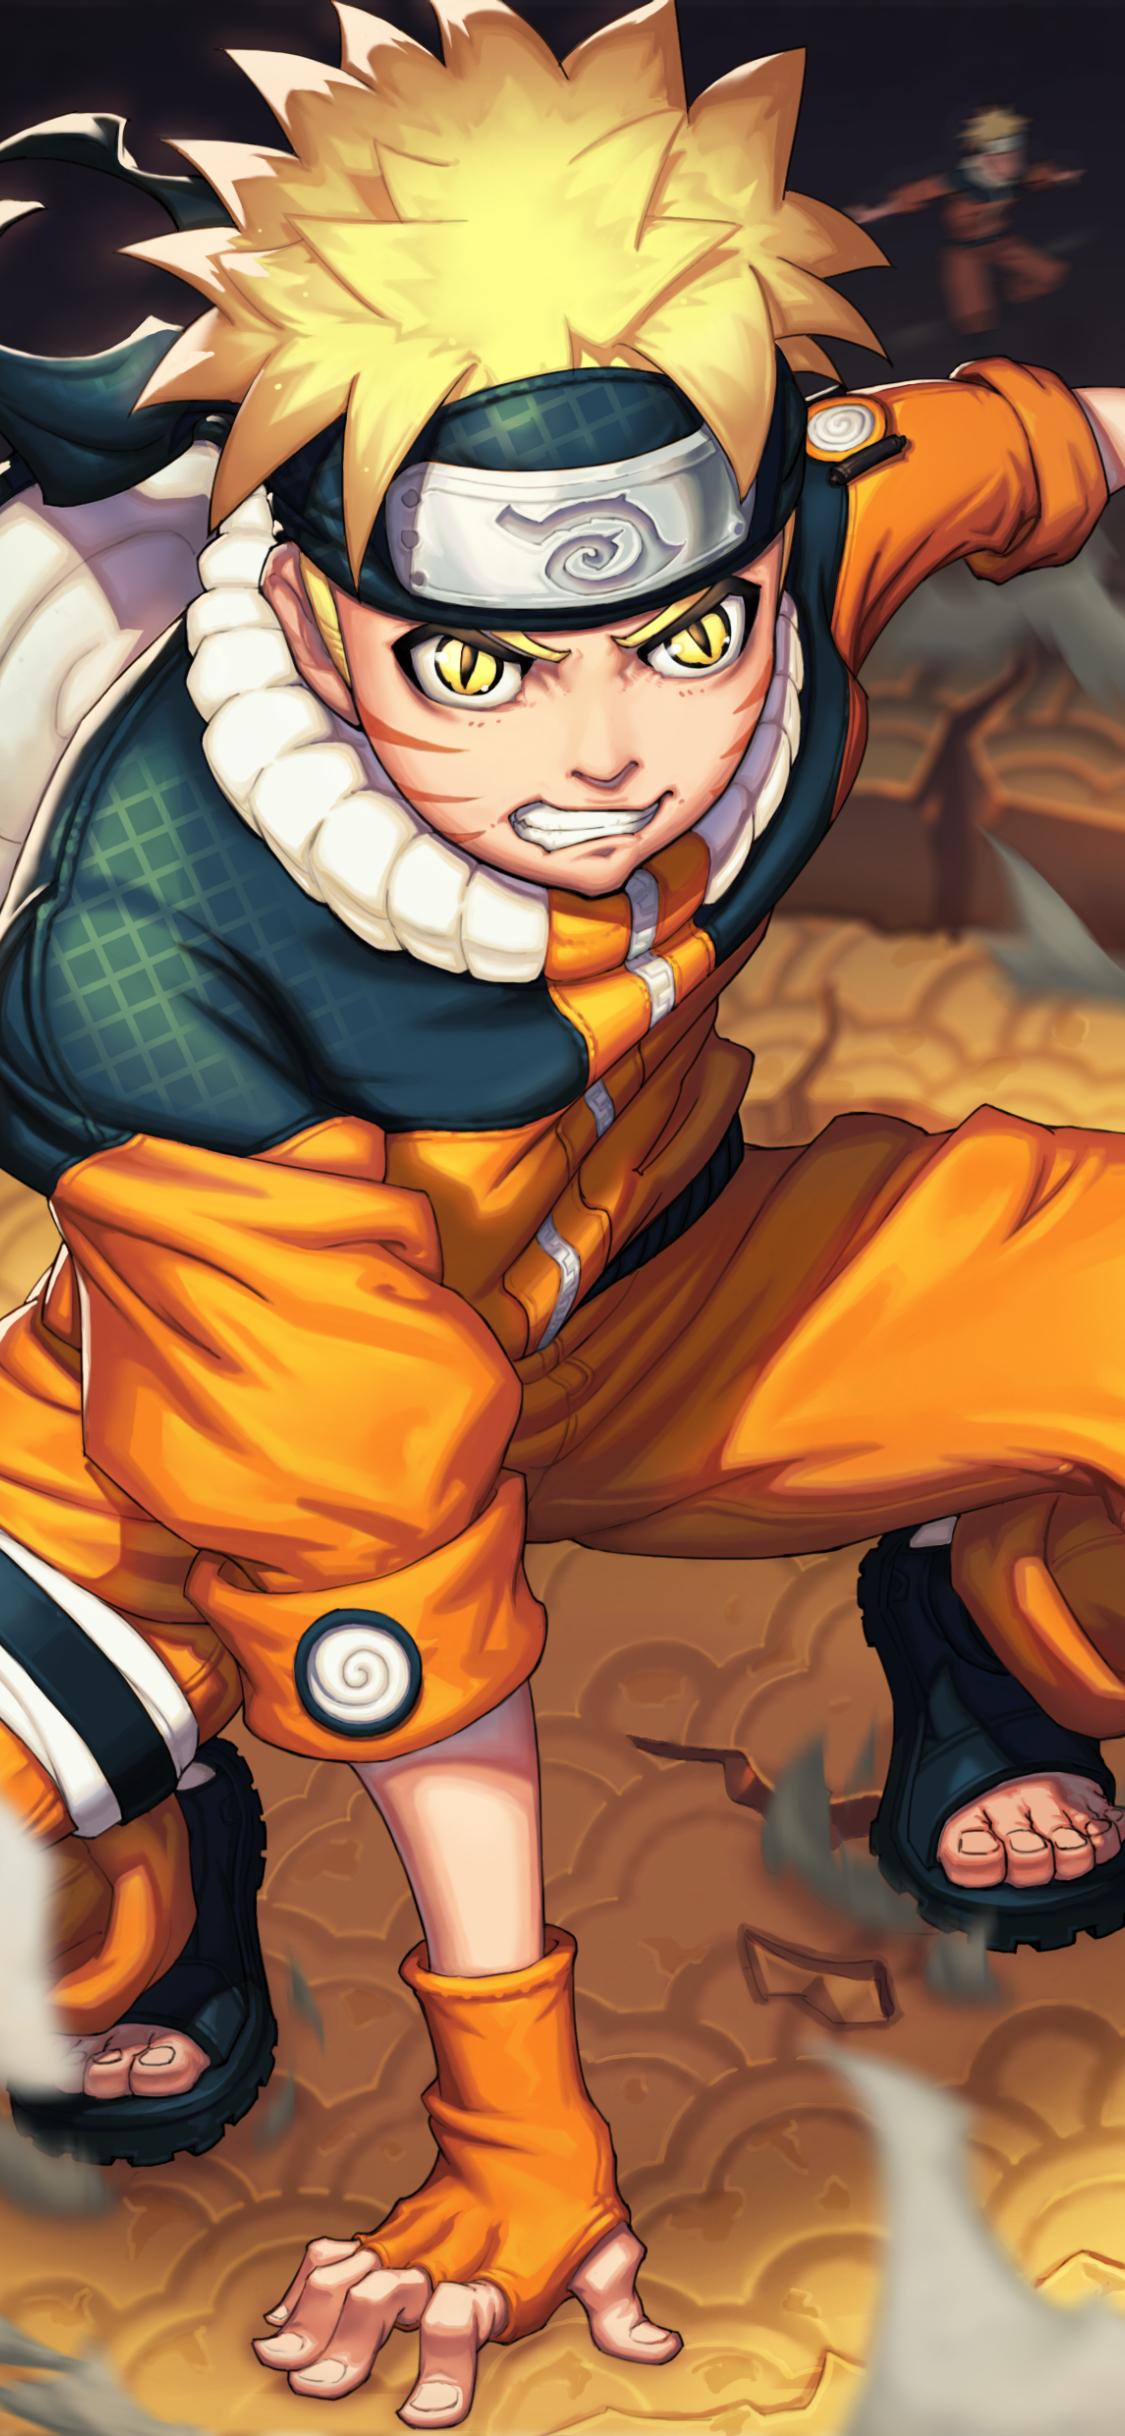 1125x2436 Naruto Uzumaki 4K Art Iphone XS,Iphone 10,Iphone ...